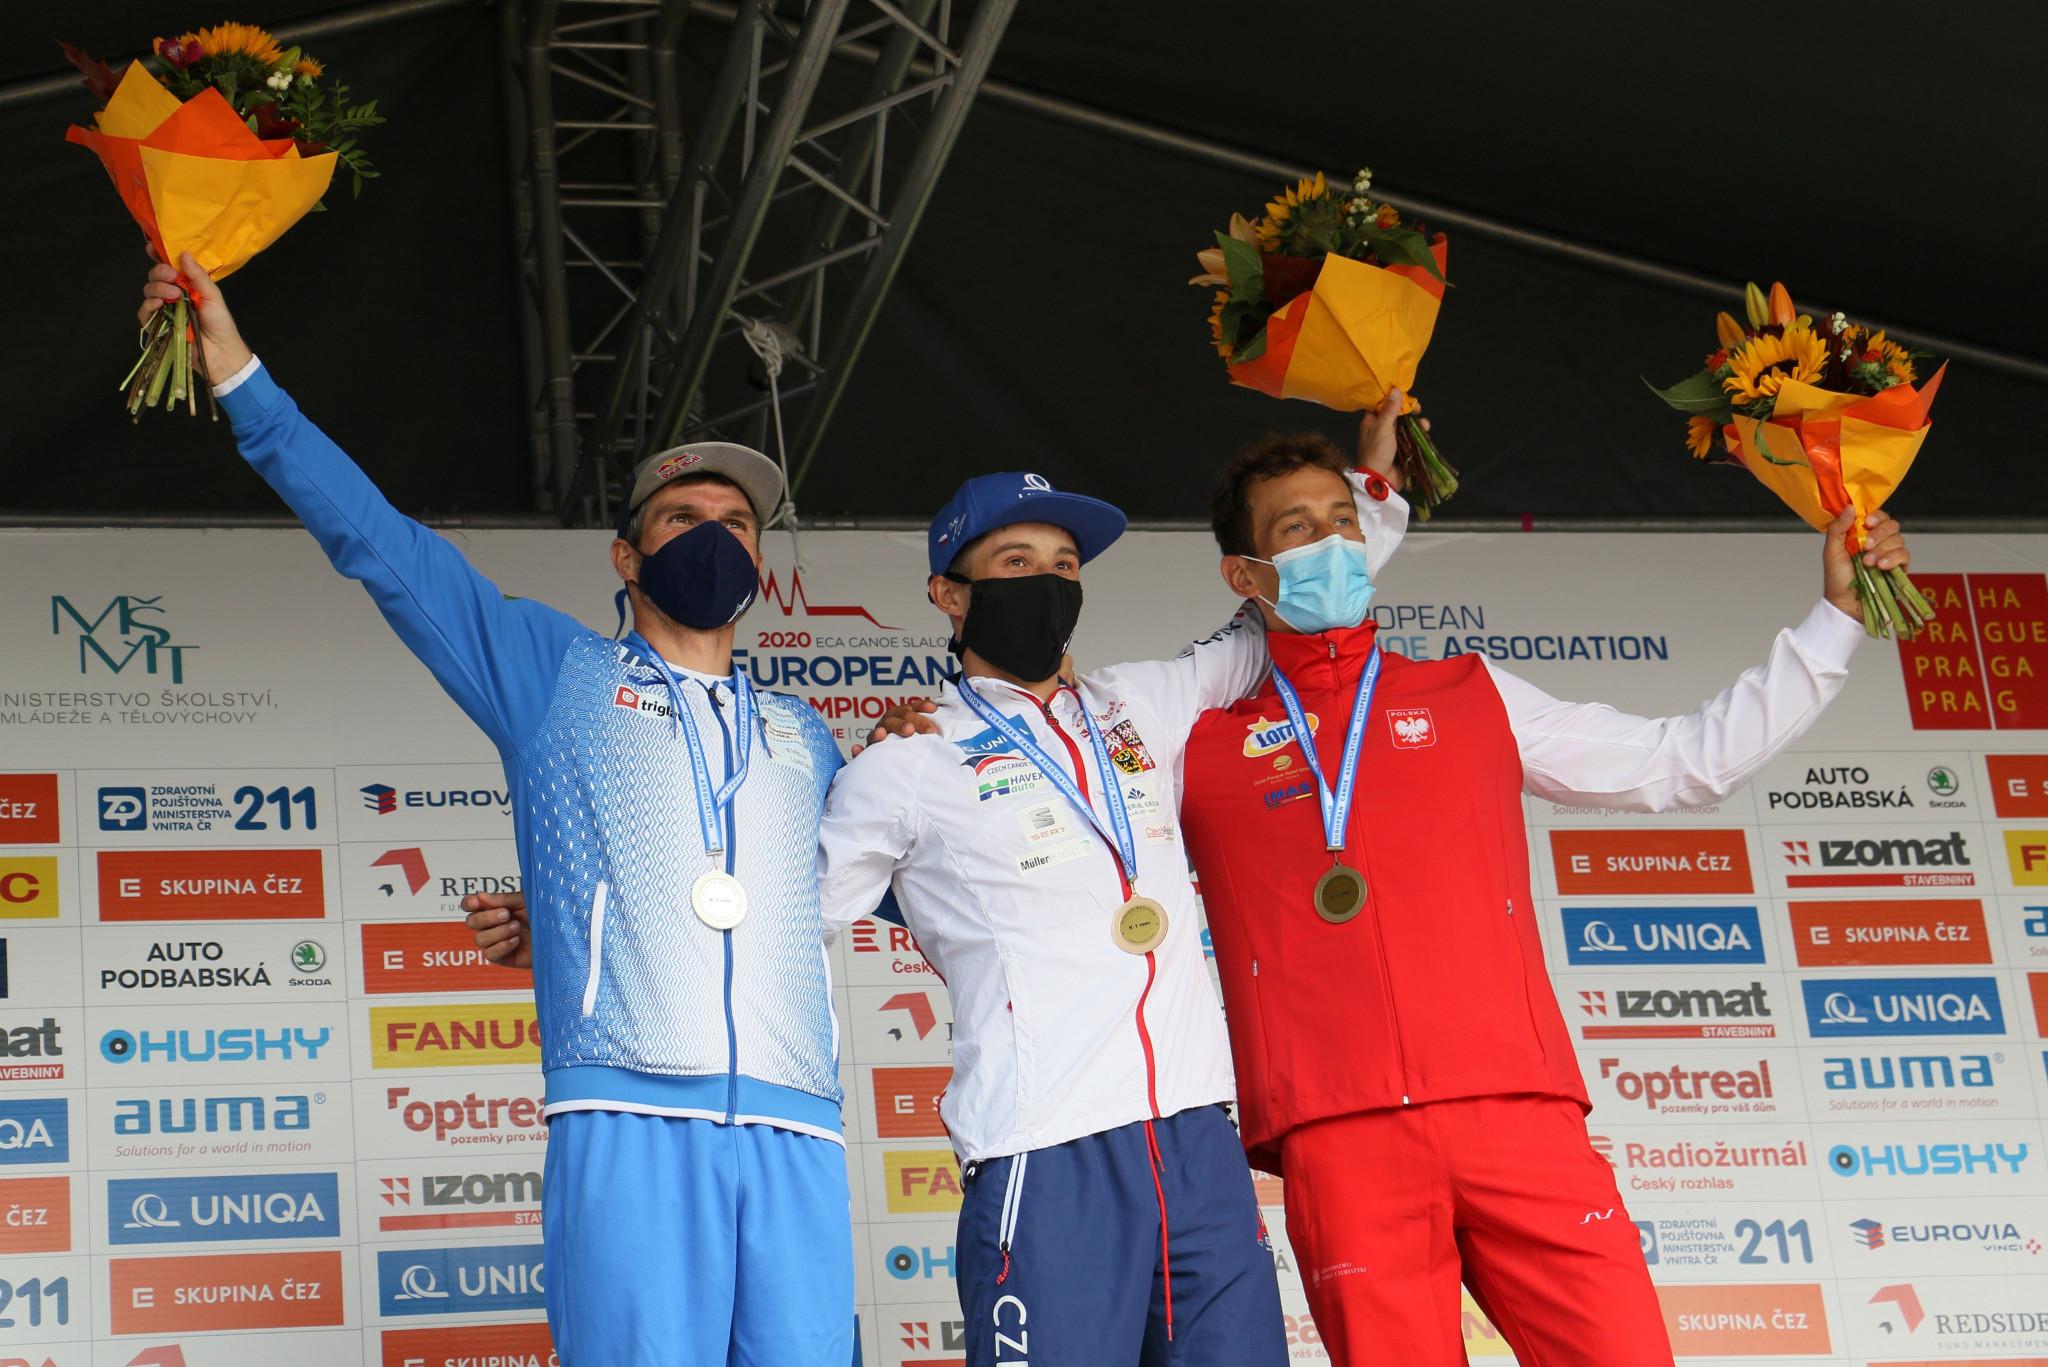 World champion Jiri Prskavec earned his fourth individual European title ©Canoe Europe